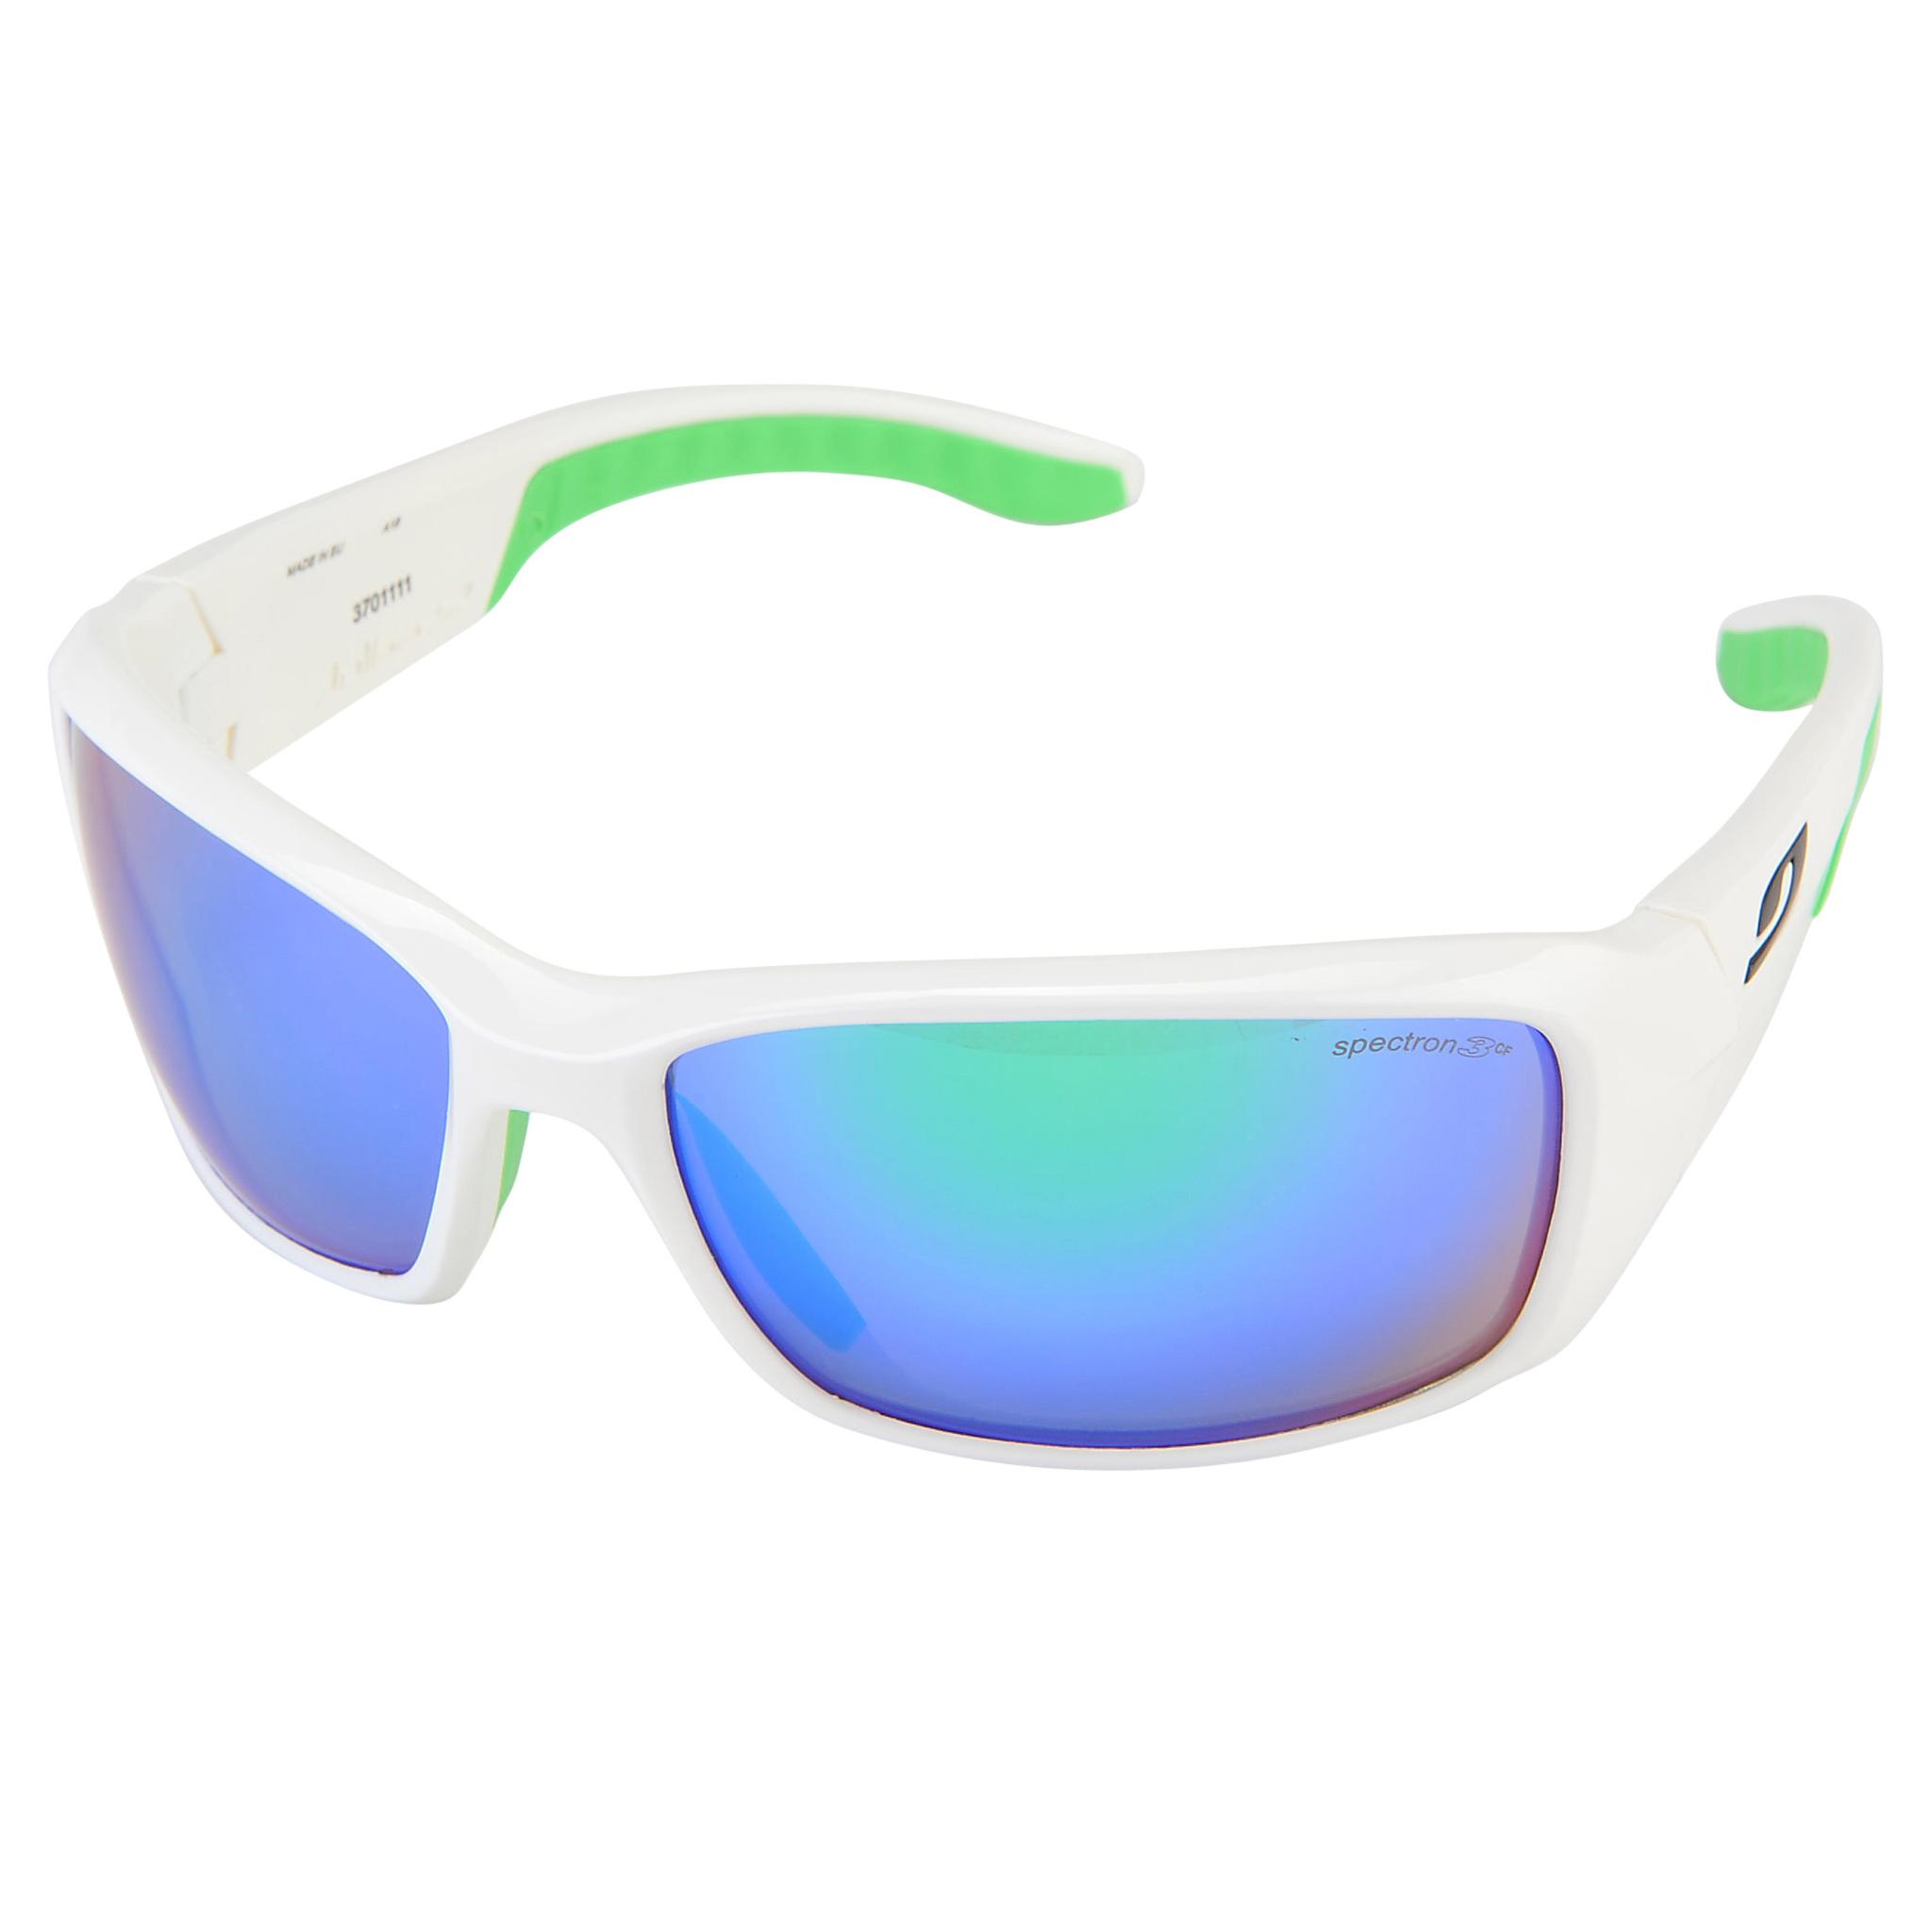 Gafas de sol JULBO RUN Blanco/Verde Iridium J3701111 2016